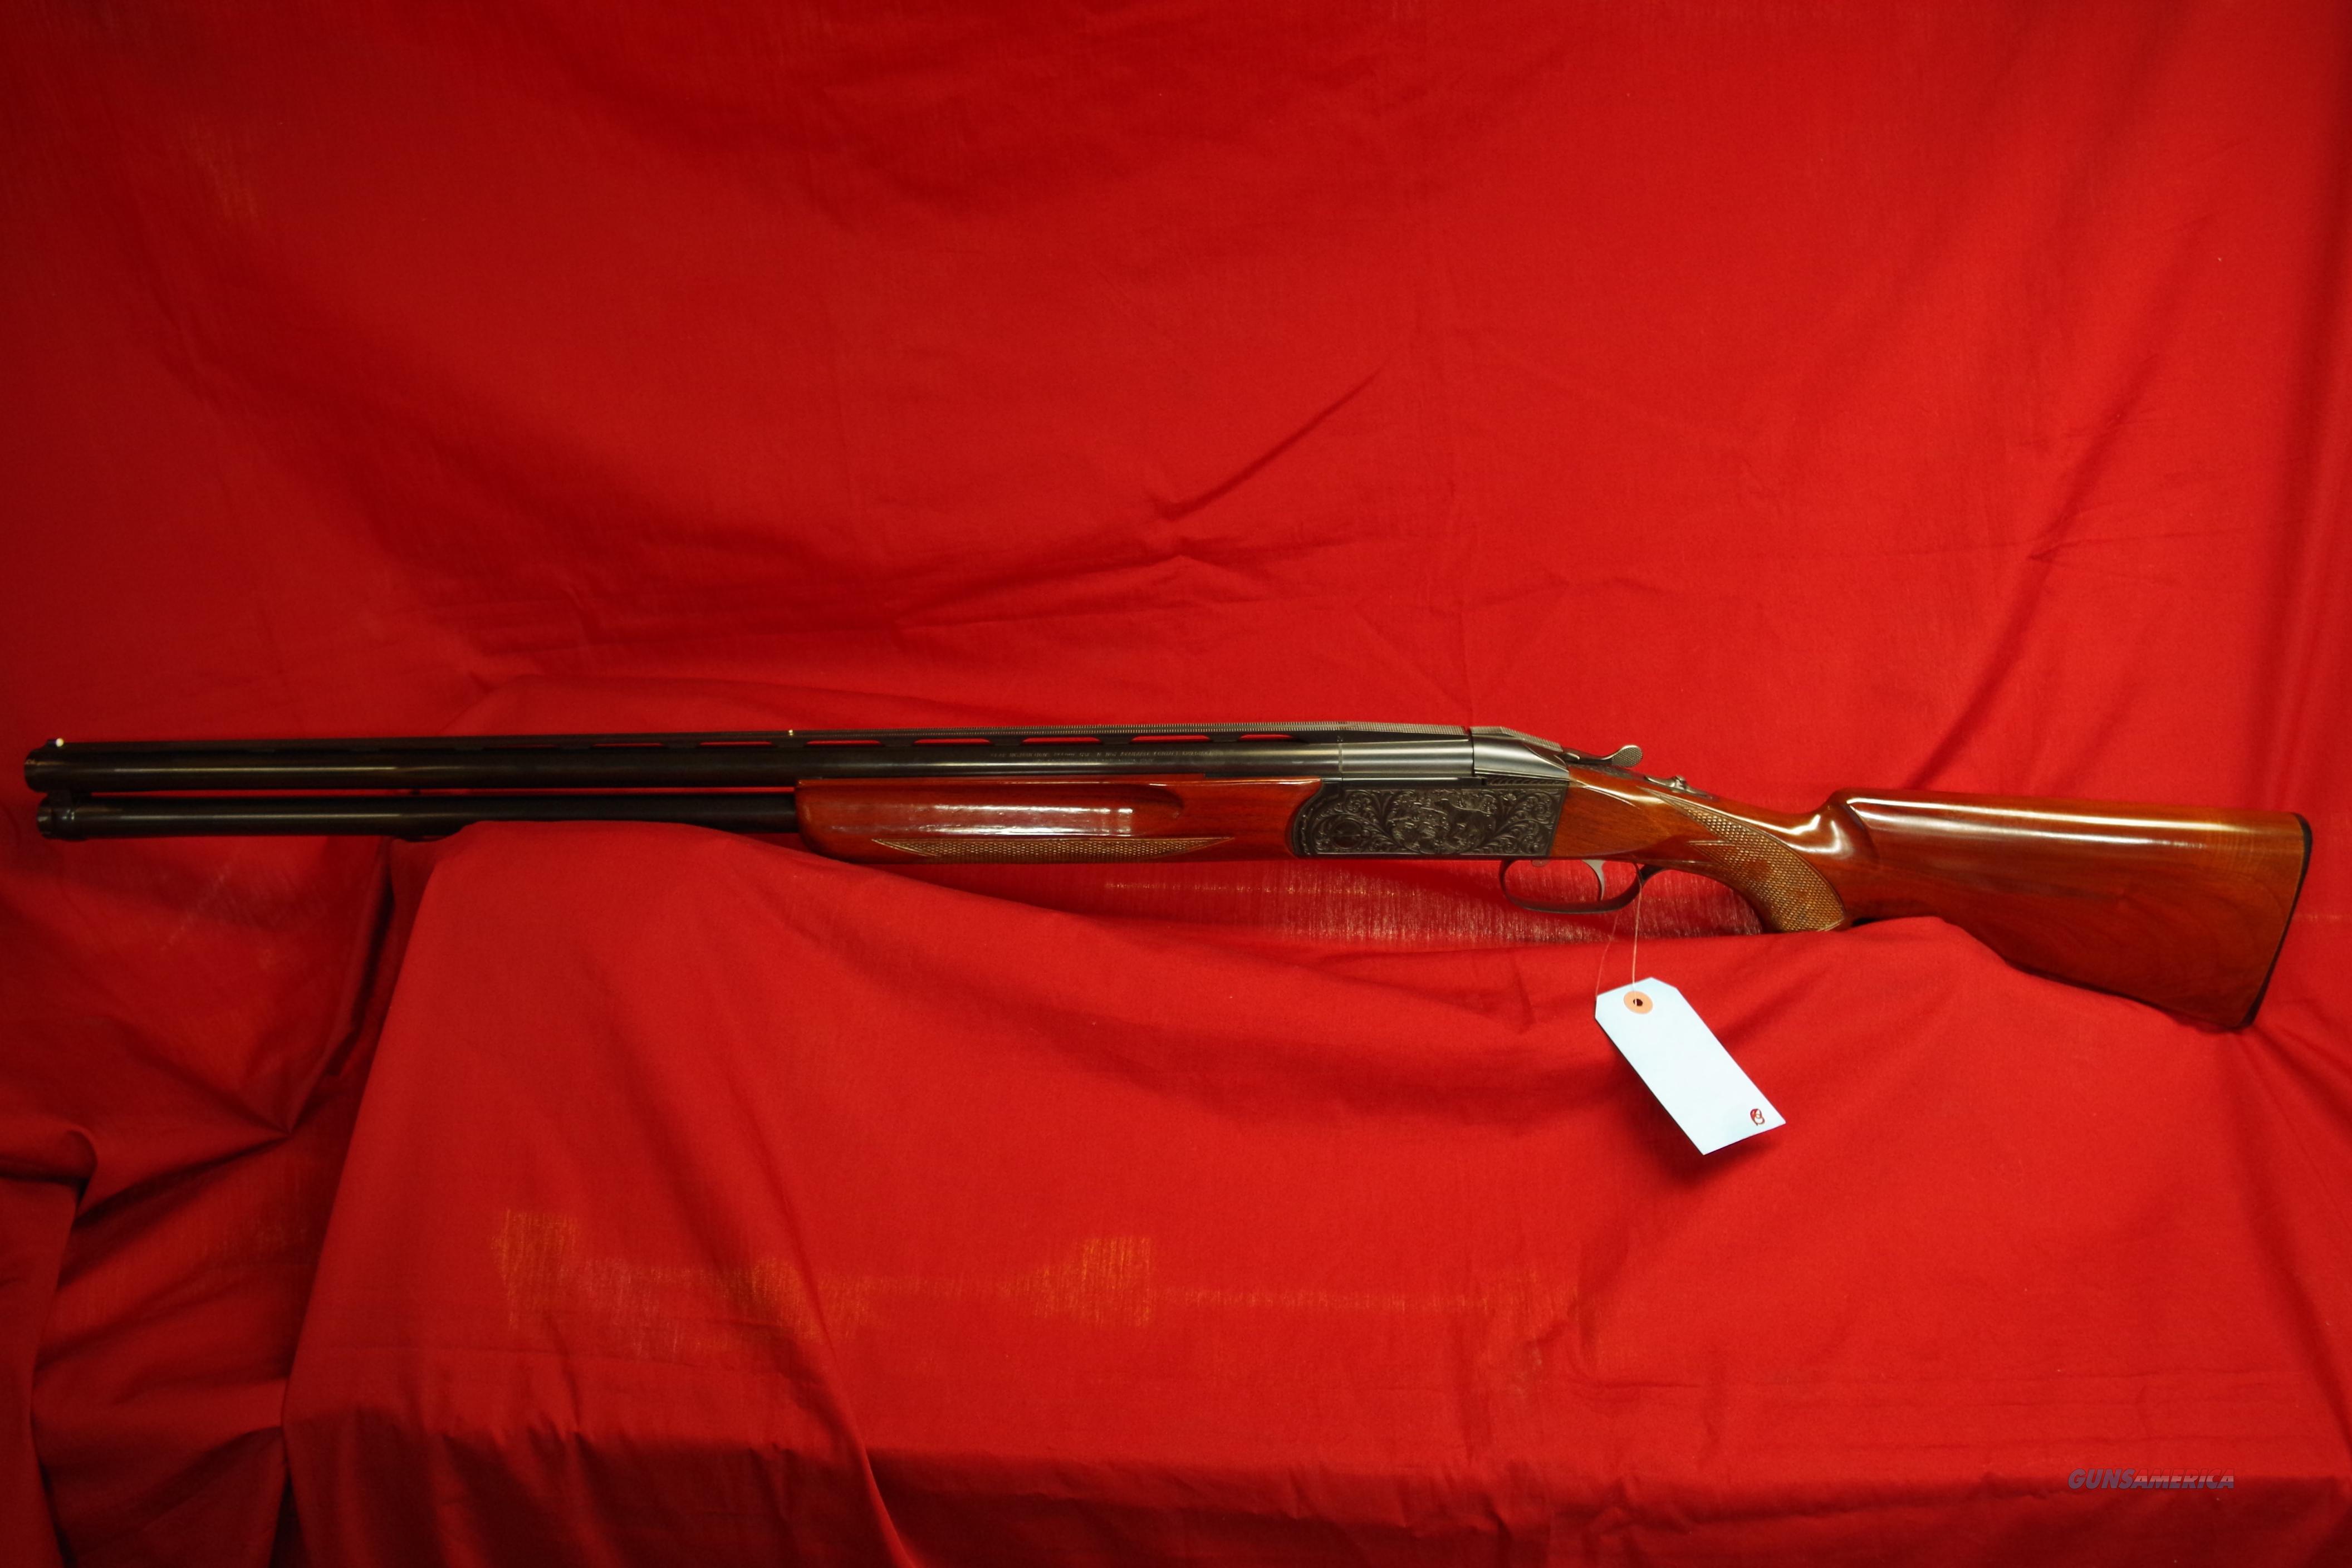 Krieghoff+K32+for+Sale KRIEGHOFF K32 VARIED CROWN!!! Guns > Shotguns